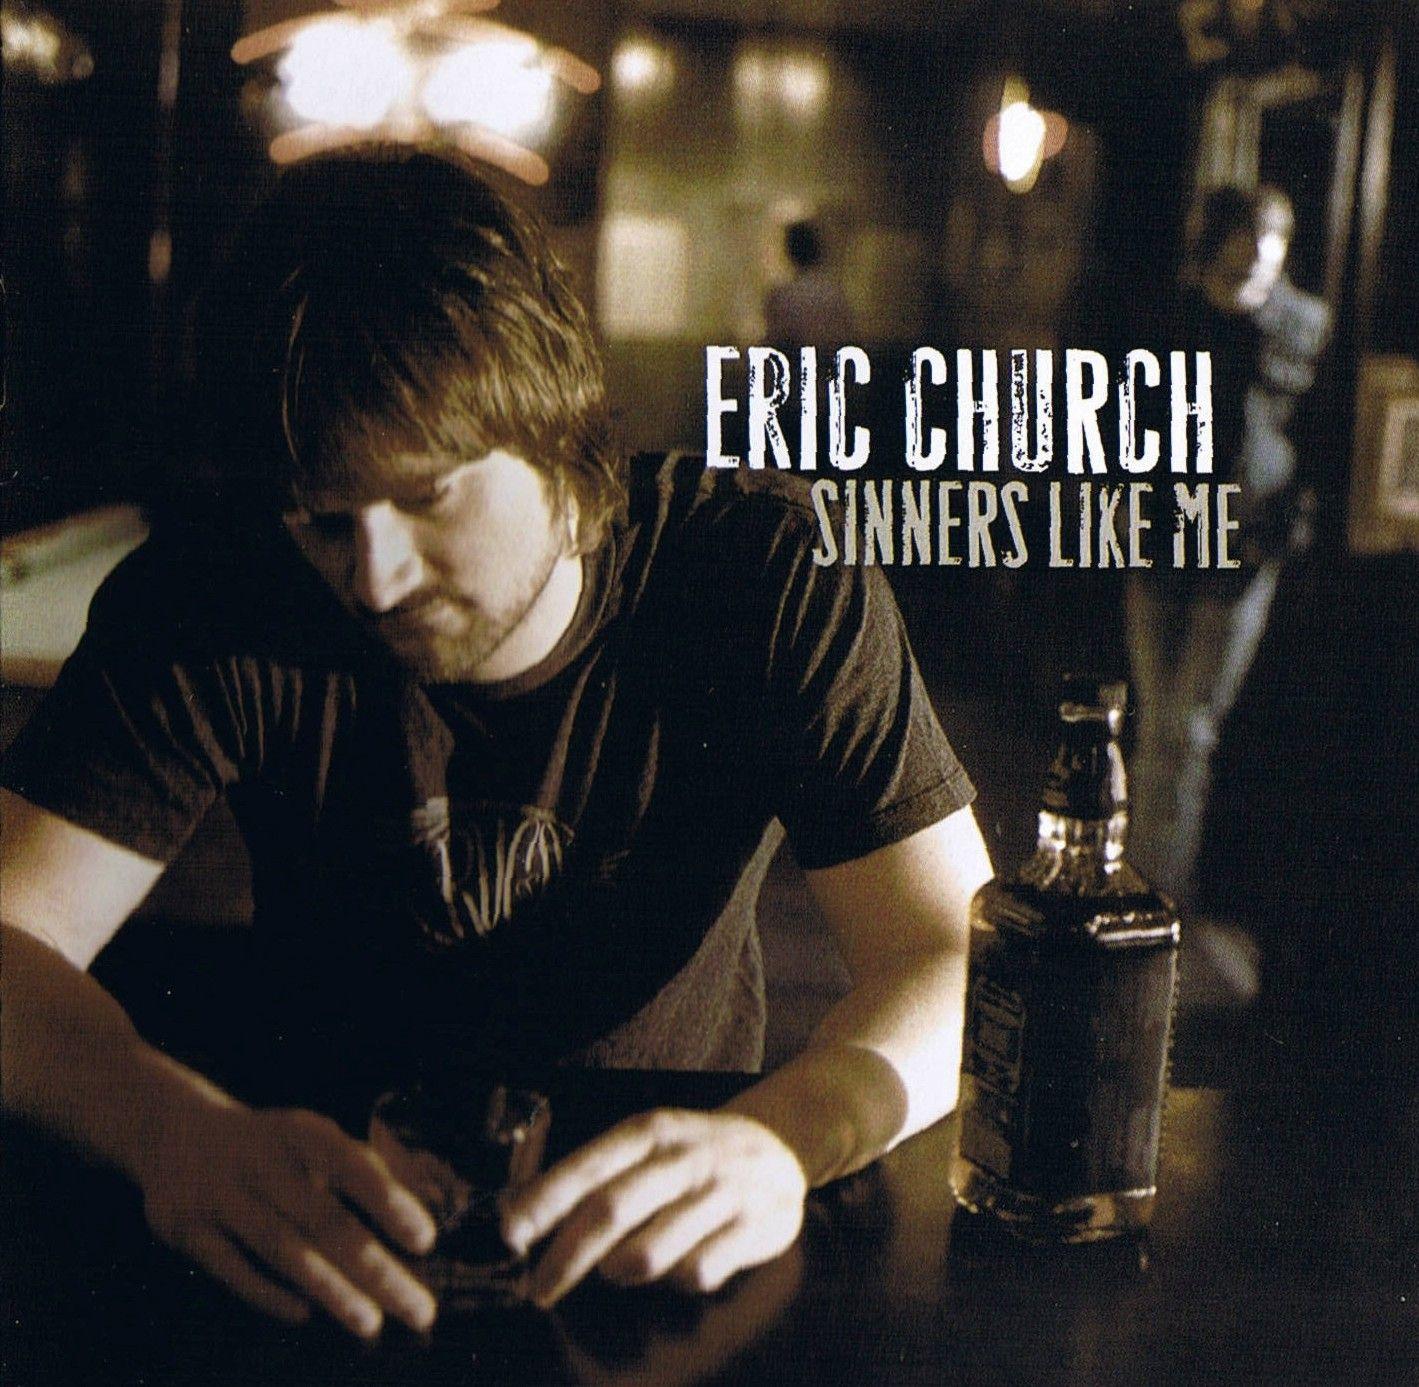 Eric Church - Sinners Like Me - Album Cover